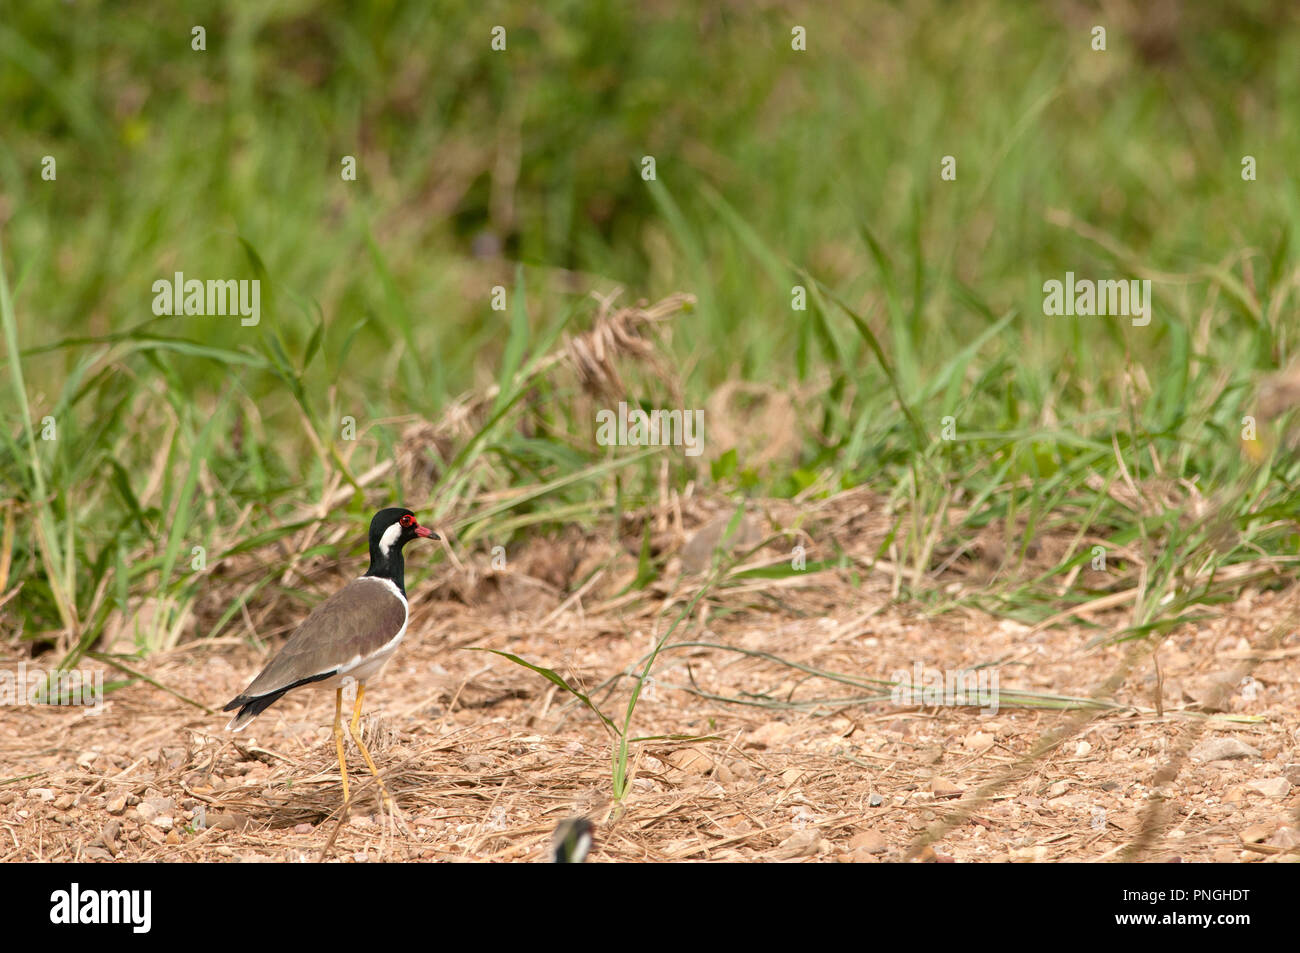 Red-Wattled Kiebitz (Vanellus indicus atronuchalis), Thailand Vanneau Indien - Stockbild